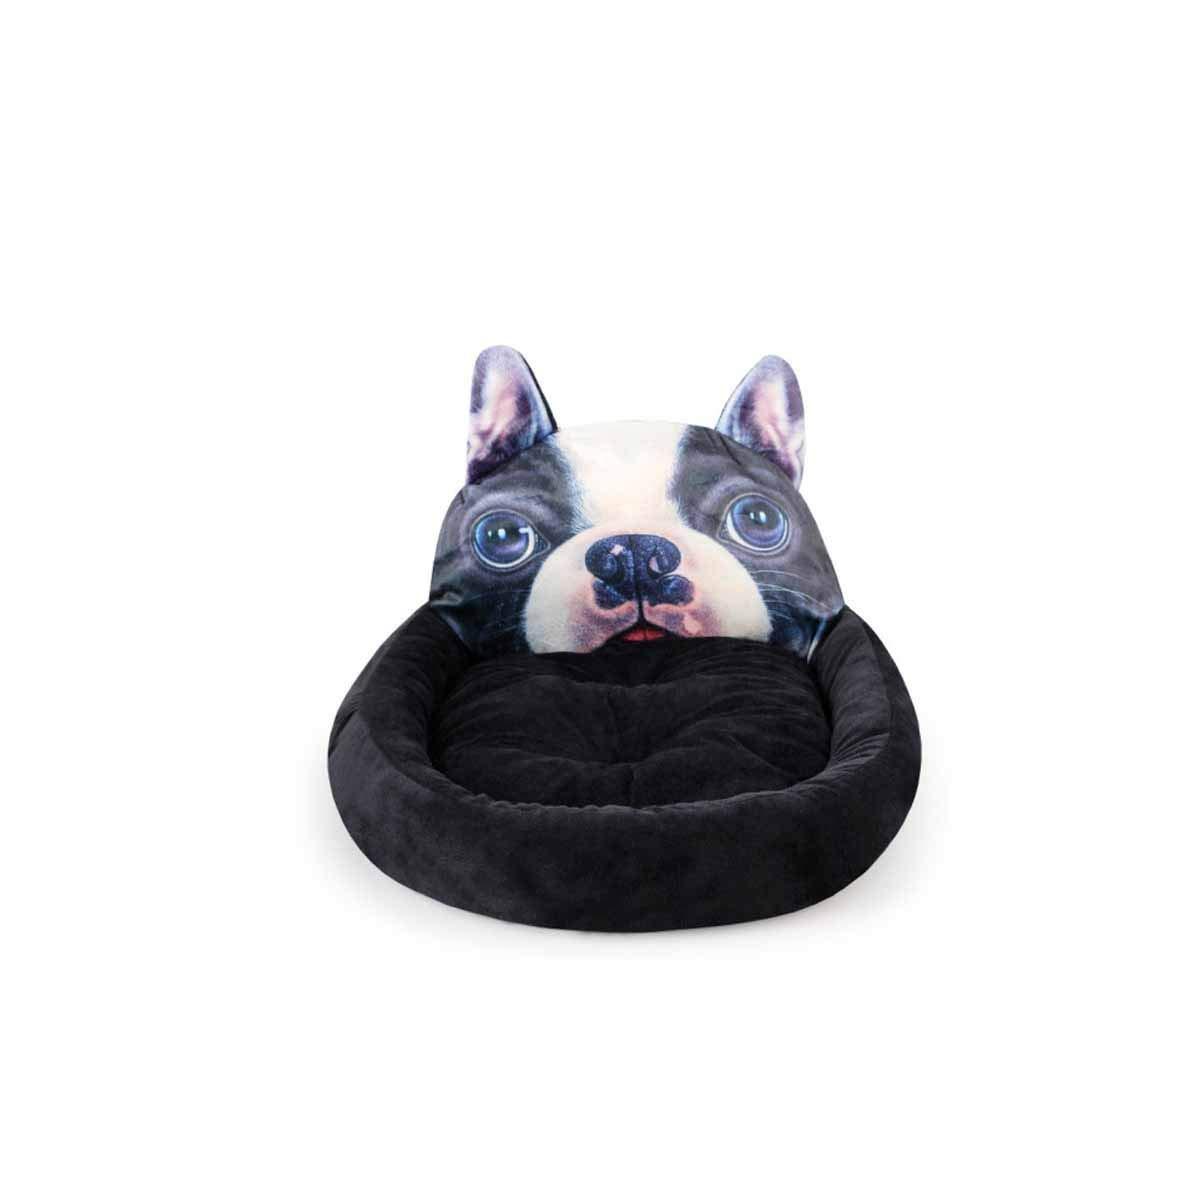 Kennel, Winter Warm Nest, Soft Teddy Bear Xiong Bomei Small Dog Pet Nest, Large Dog in Pet Mattress, Labrador Bullfighting Nest, Dog Mat, Four Season House (Size   L)